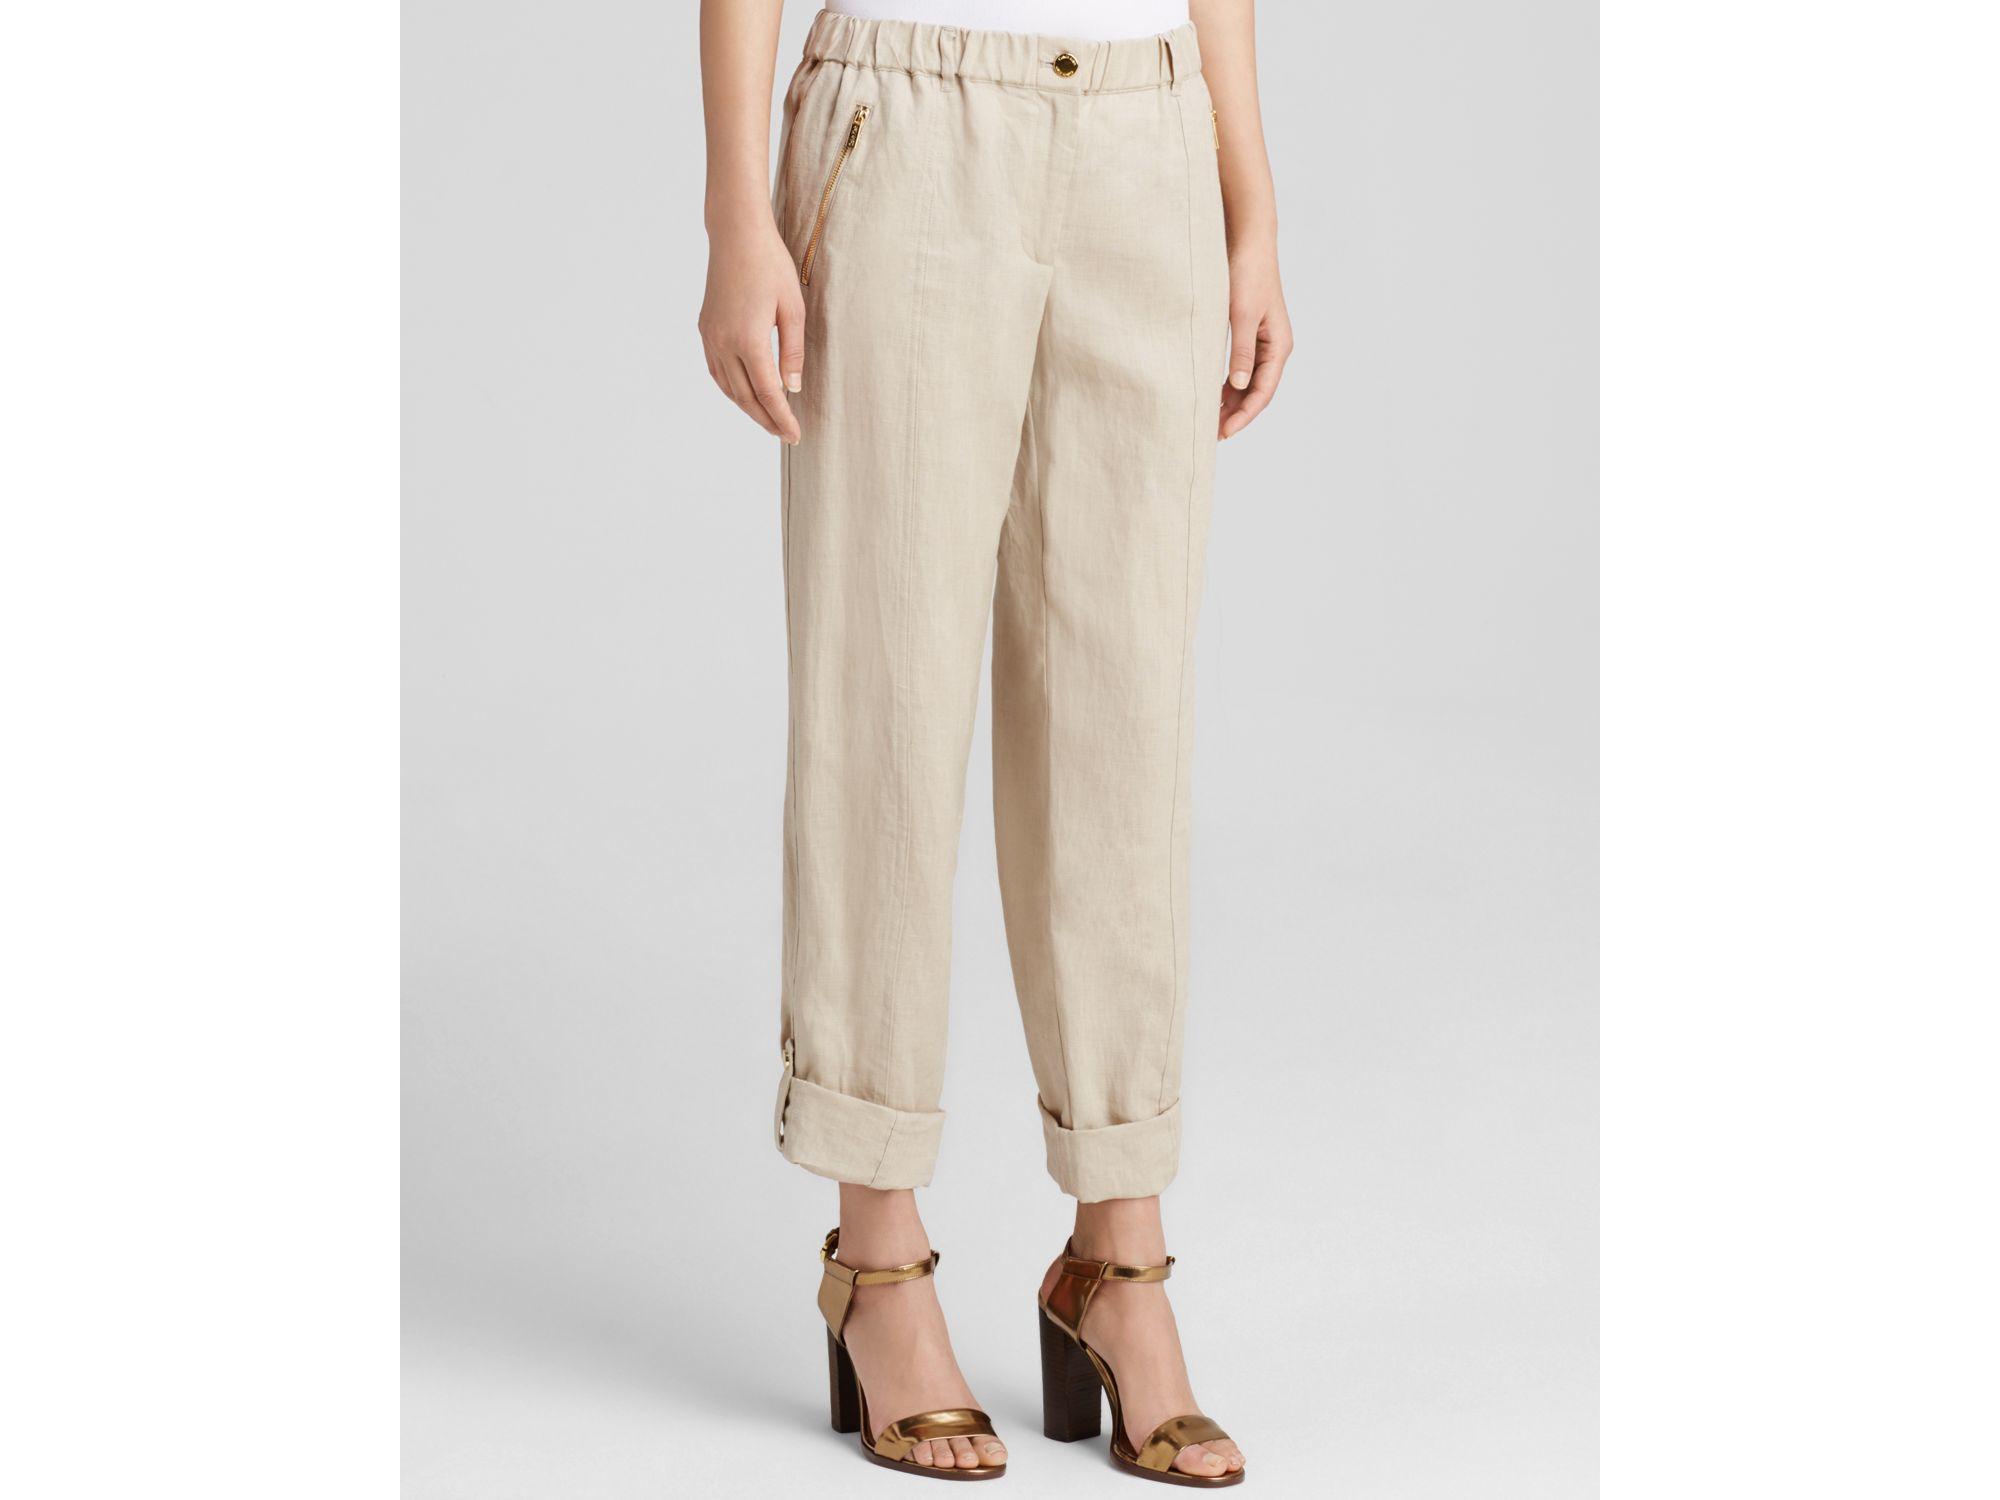 Calvin klein Roll Cuff Linen Pants in Natural | Lyst